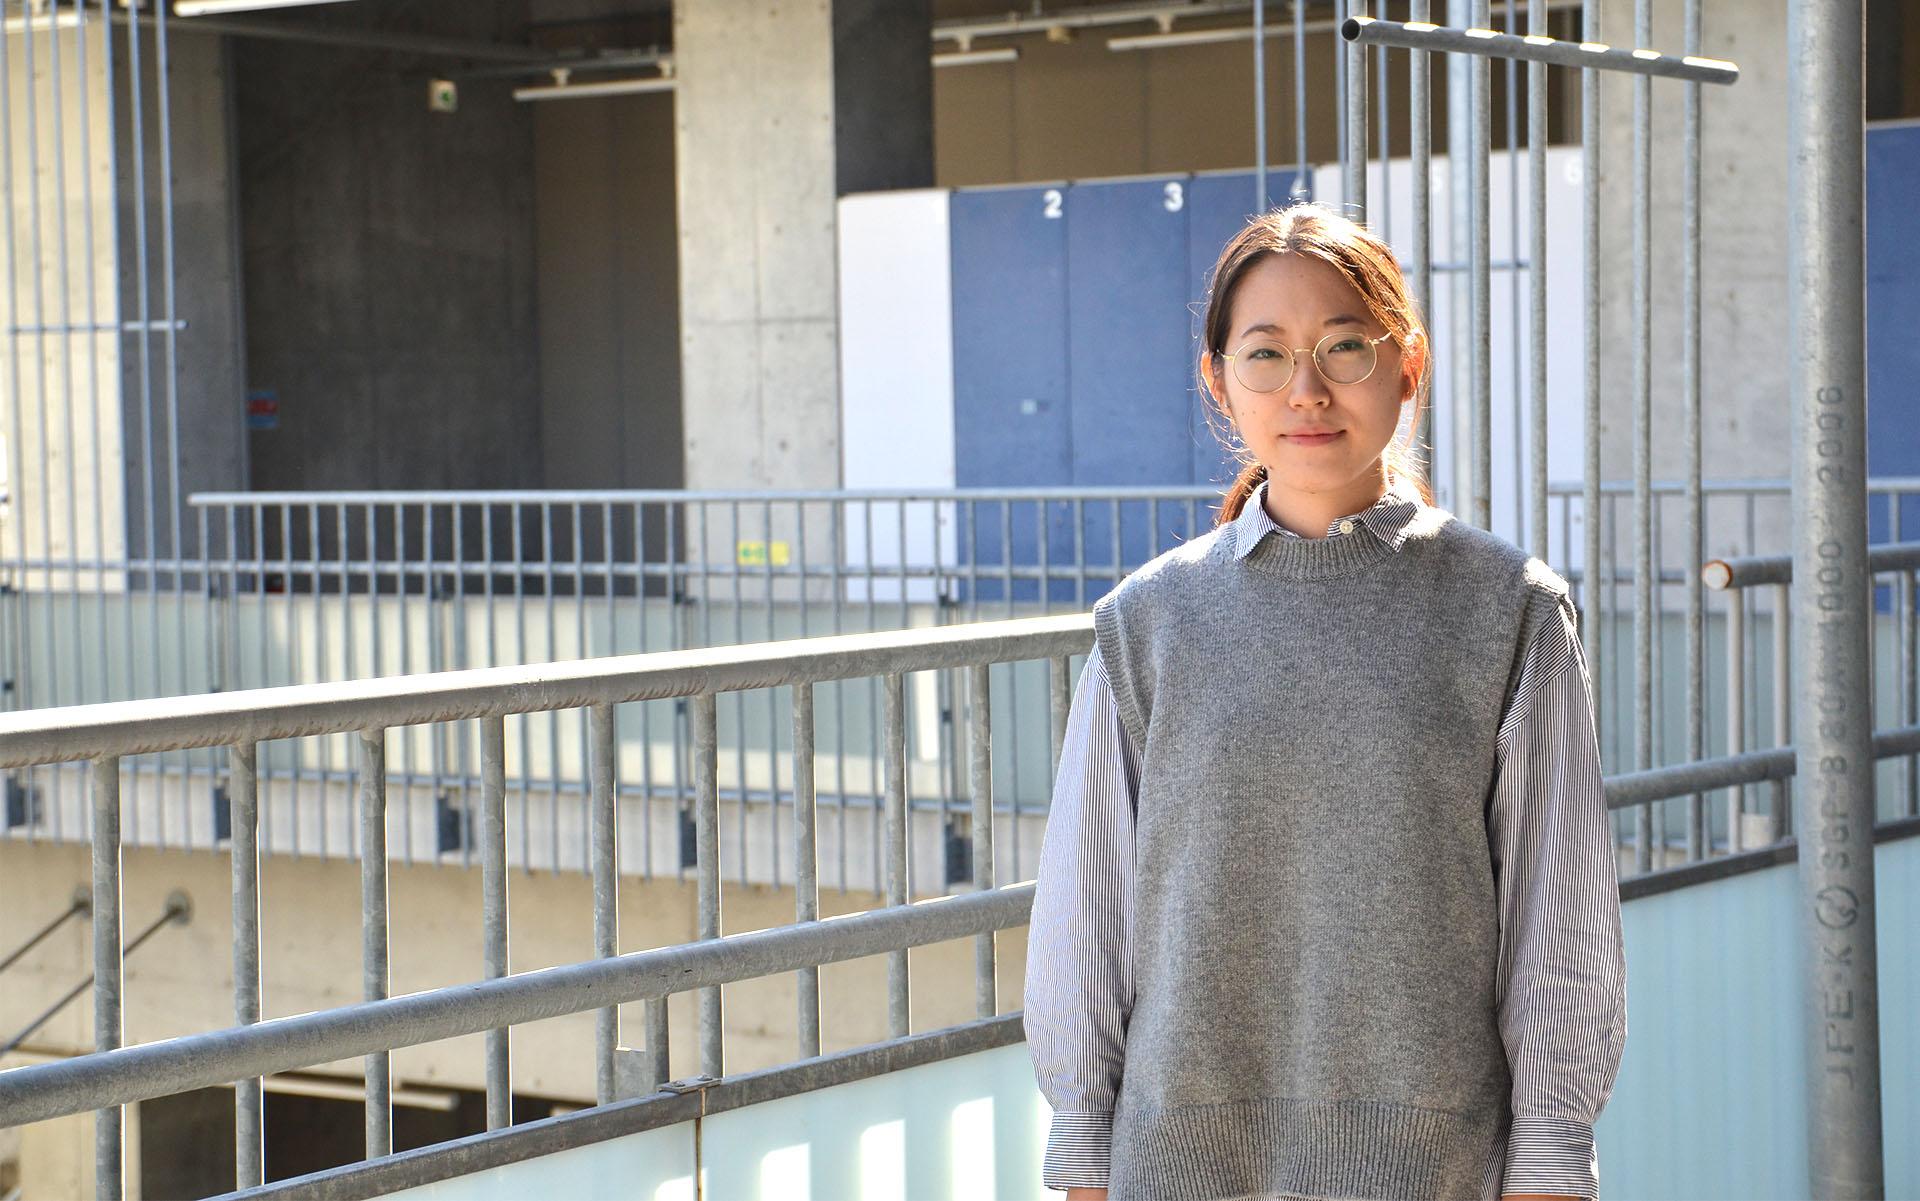 ashikawa_interview_main